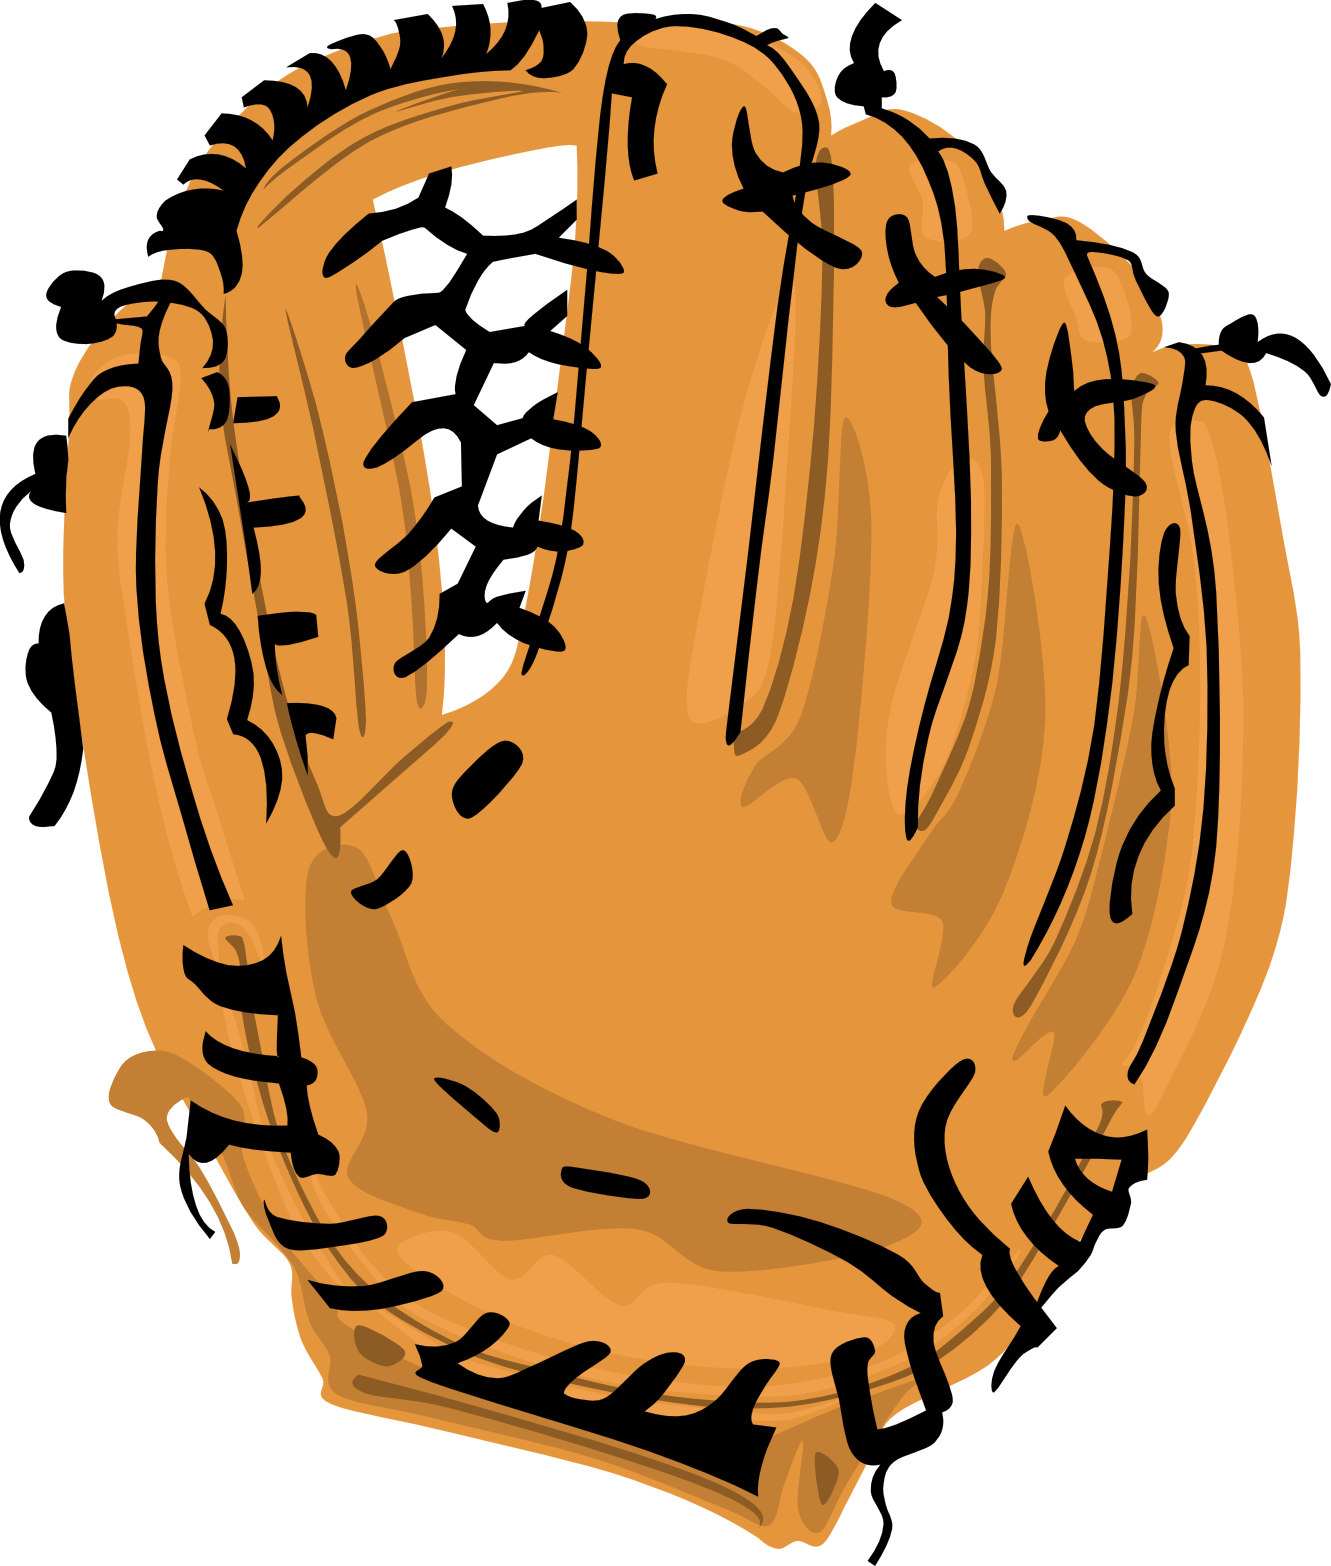 Fun baseball clipart jpg royalty free library Mitt 20clipart   Clipart Panda - Free Clipart Images jpg royalty free library